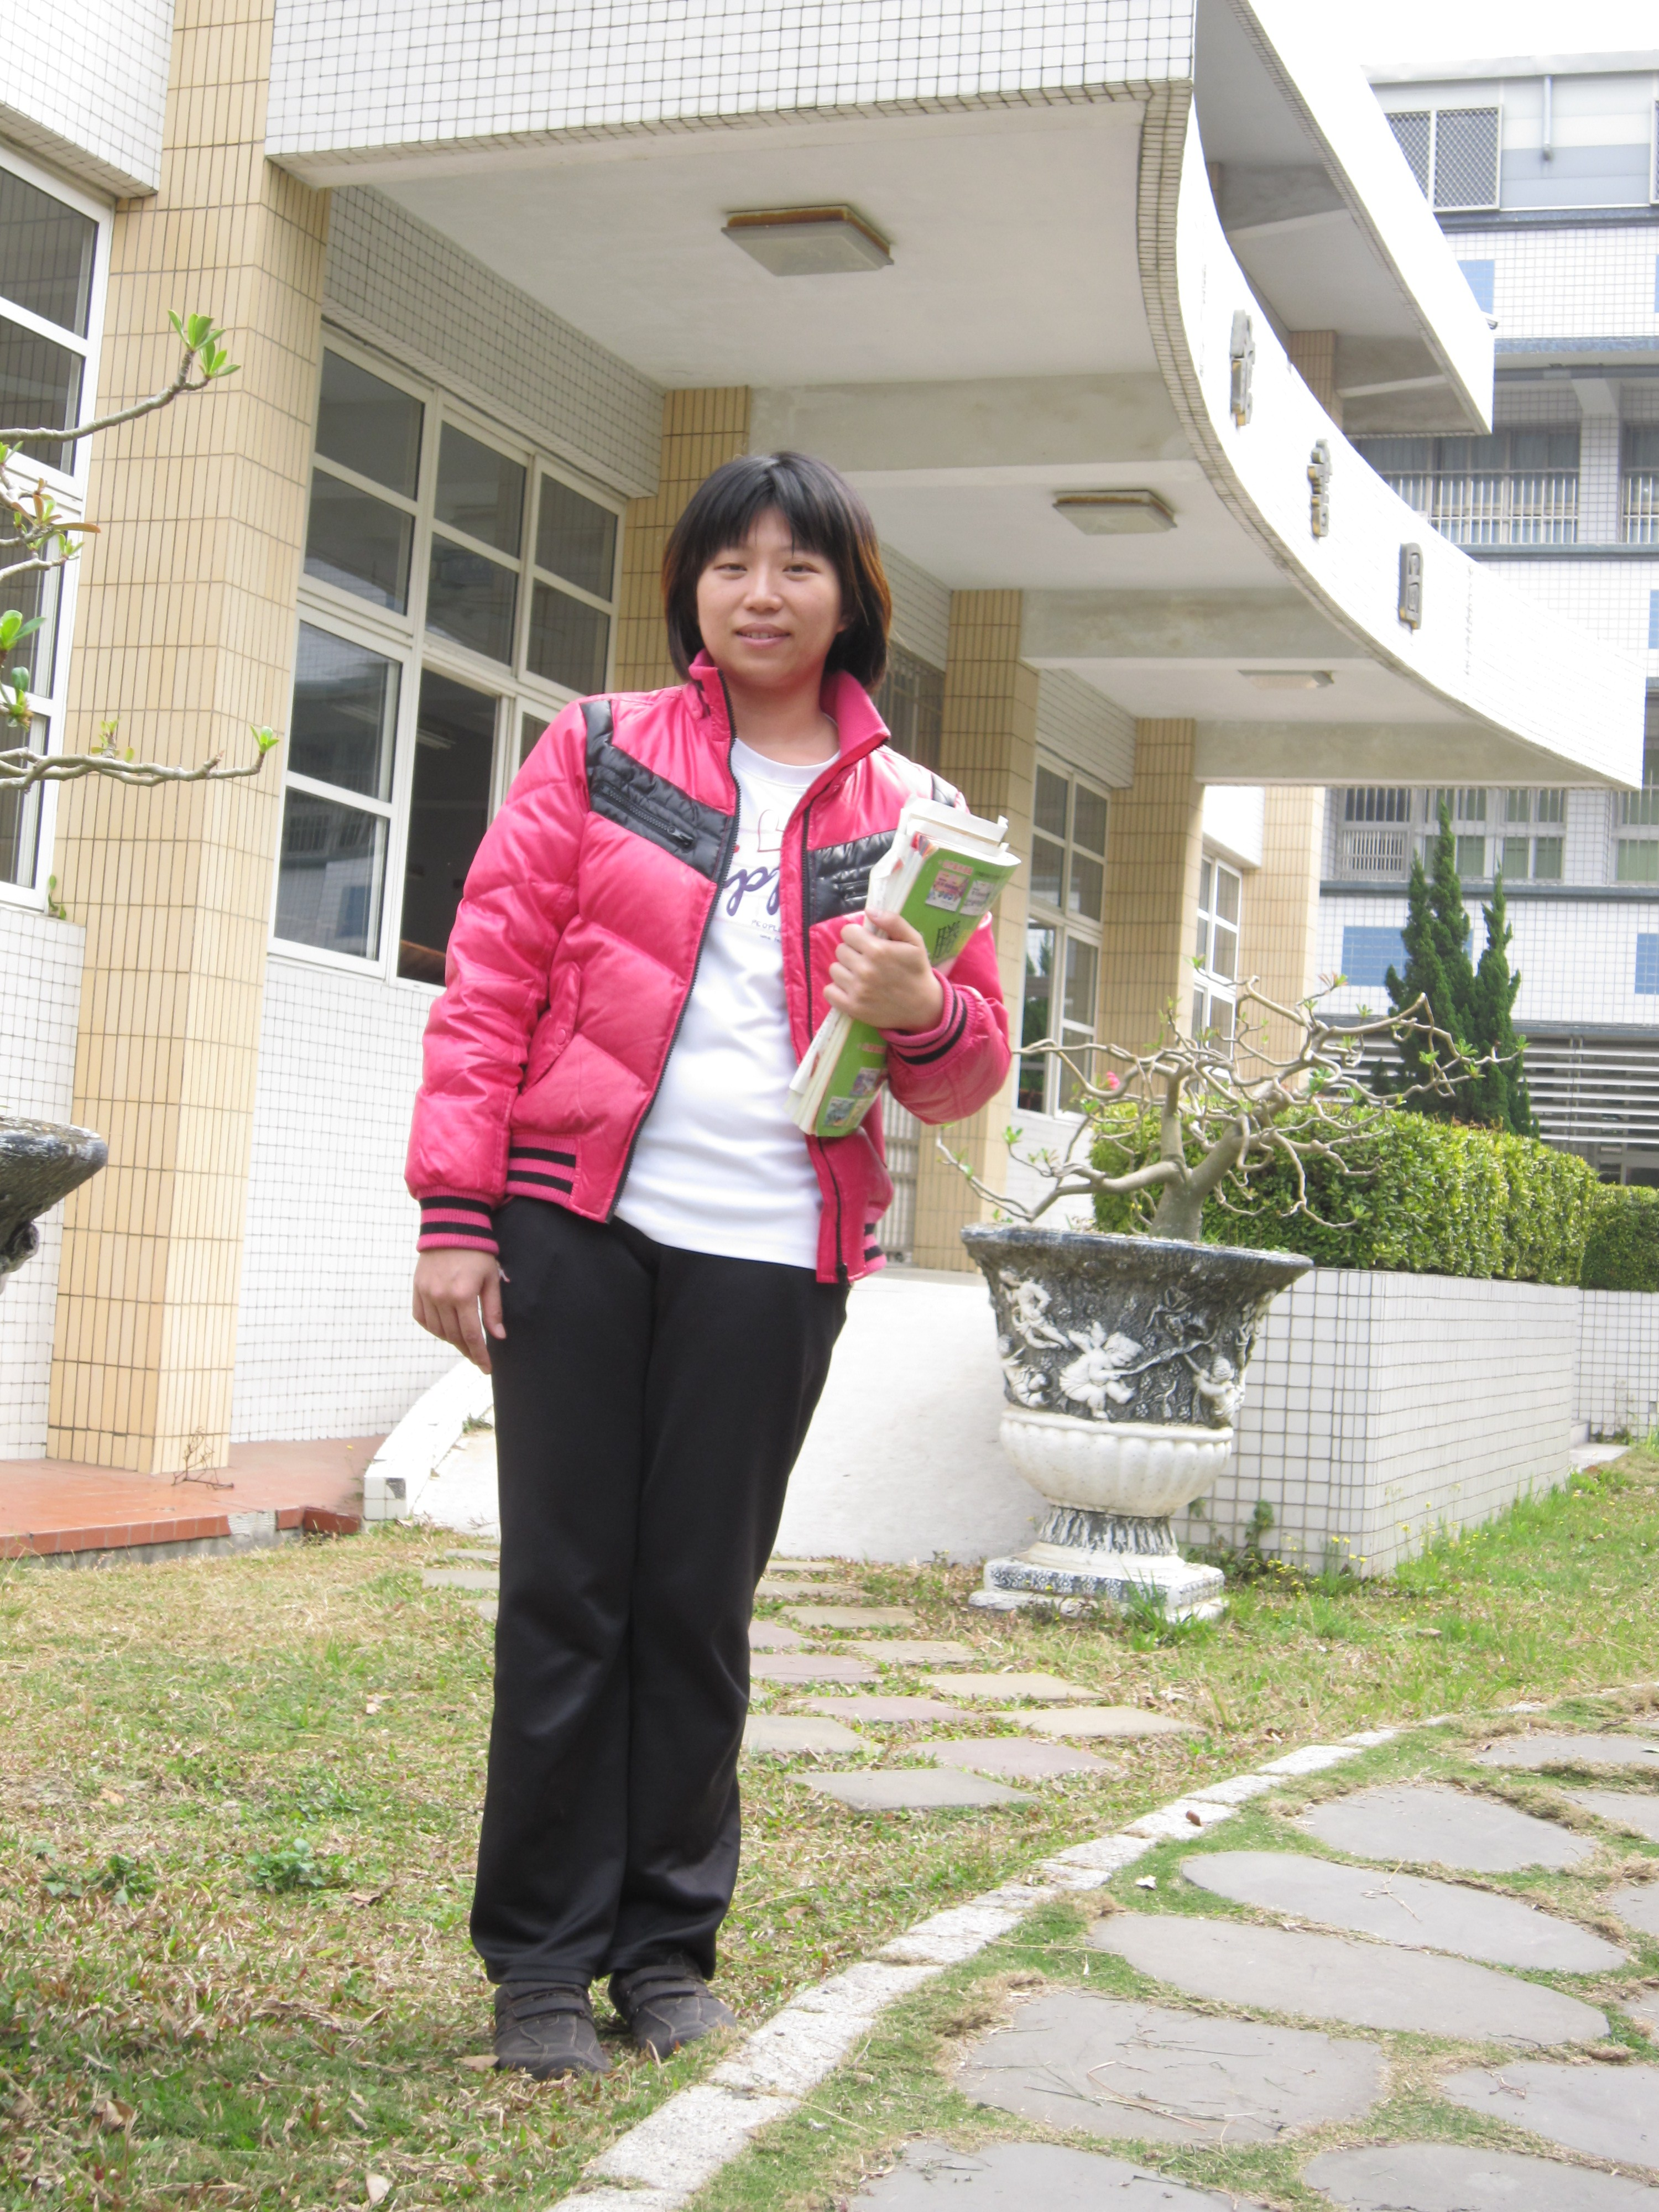 http://www.ptjhs.chc.edu.tw/uploads/tadgallery/2011_02_15/1809_謝鴻華.JPG